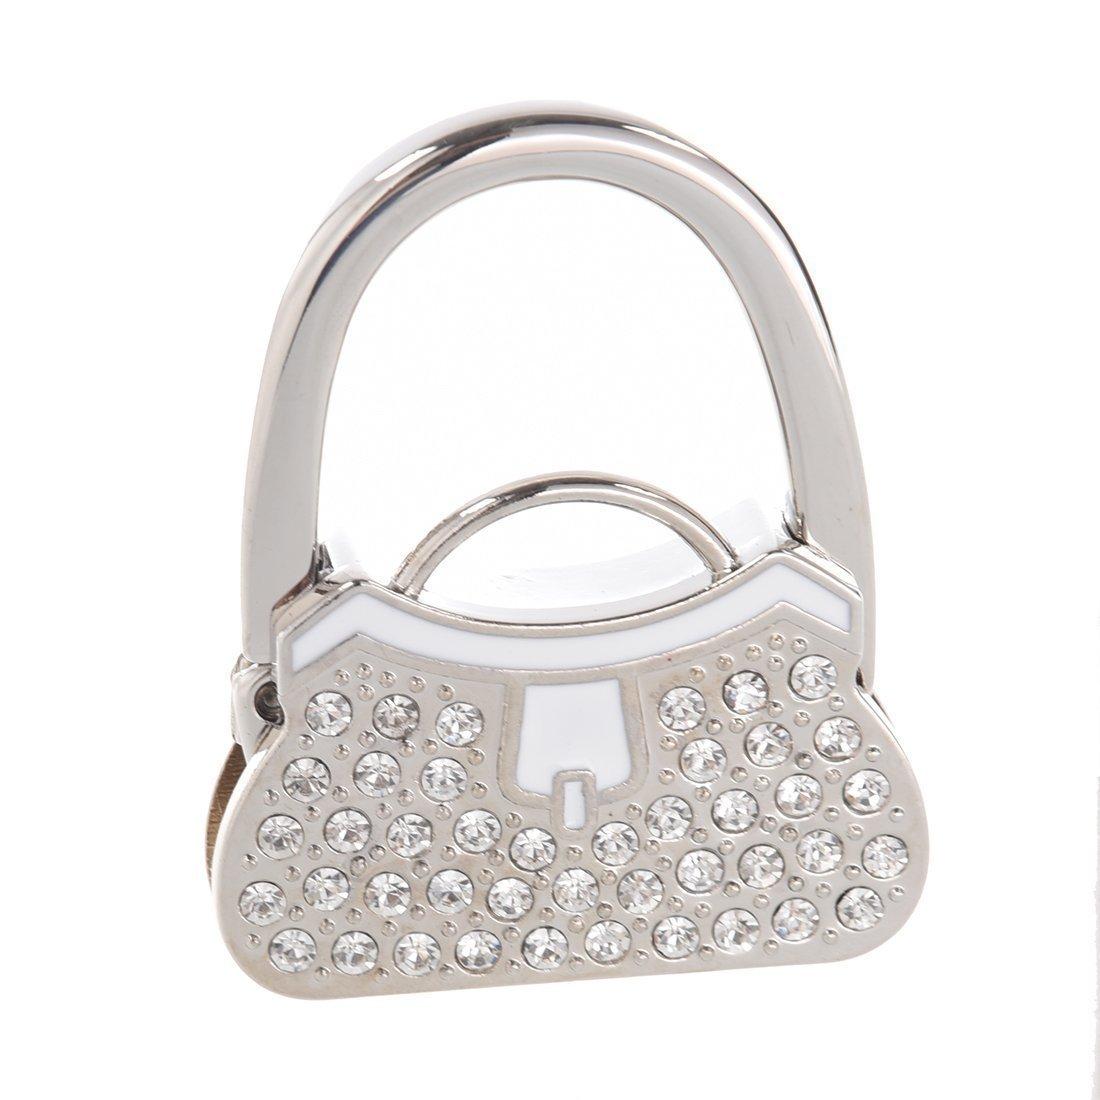 SODIAL(R) Sostenedor percha gancho de mesa monedero bolso plegable diamante de imitacion metal NTWNMJHGDU495